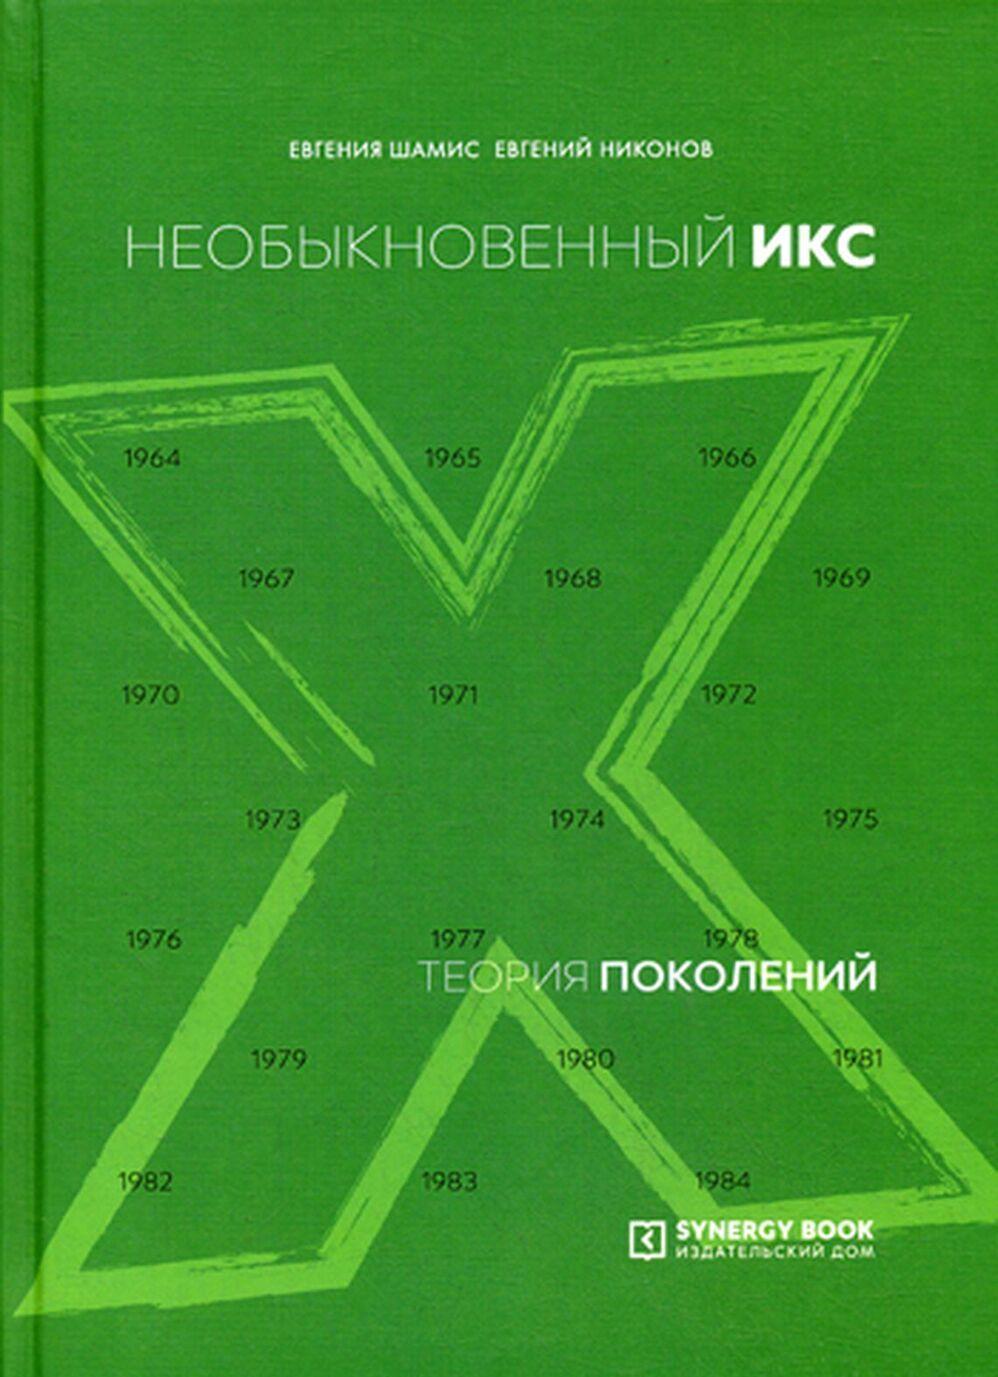 Teorija pokolenij. neobyknovennyj Iks. (per.). 6-e izd., ispr